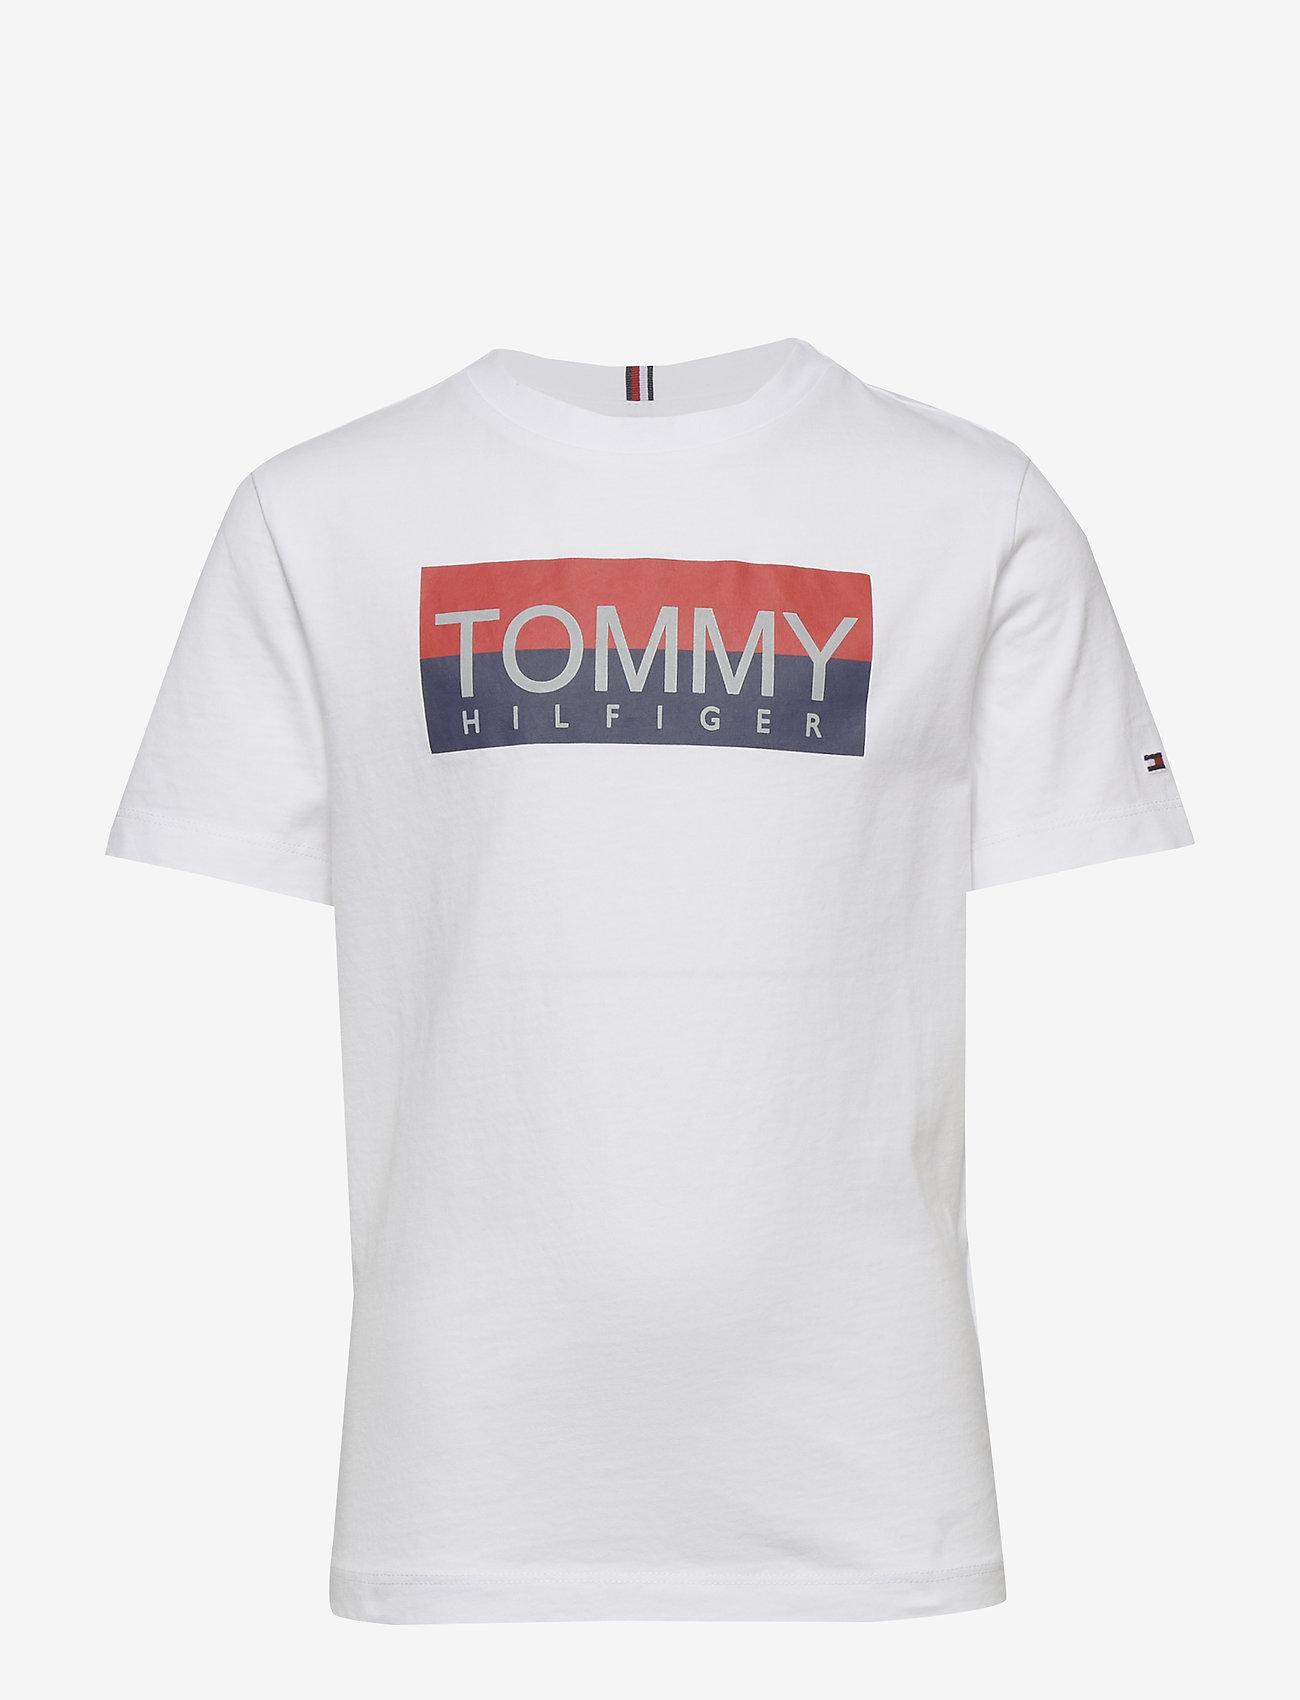 Tommy Hilfiger - REFLECTIVE HILFIGER TEE S/S - short-sleeved - white 658-170 - 0